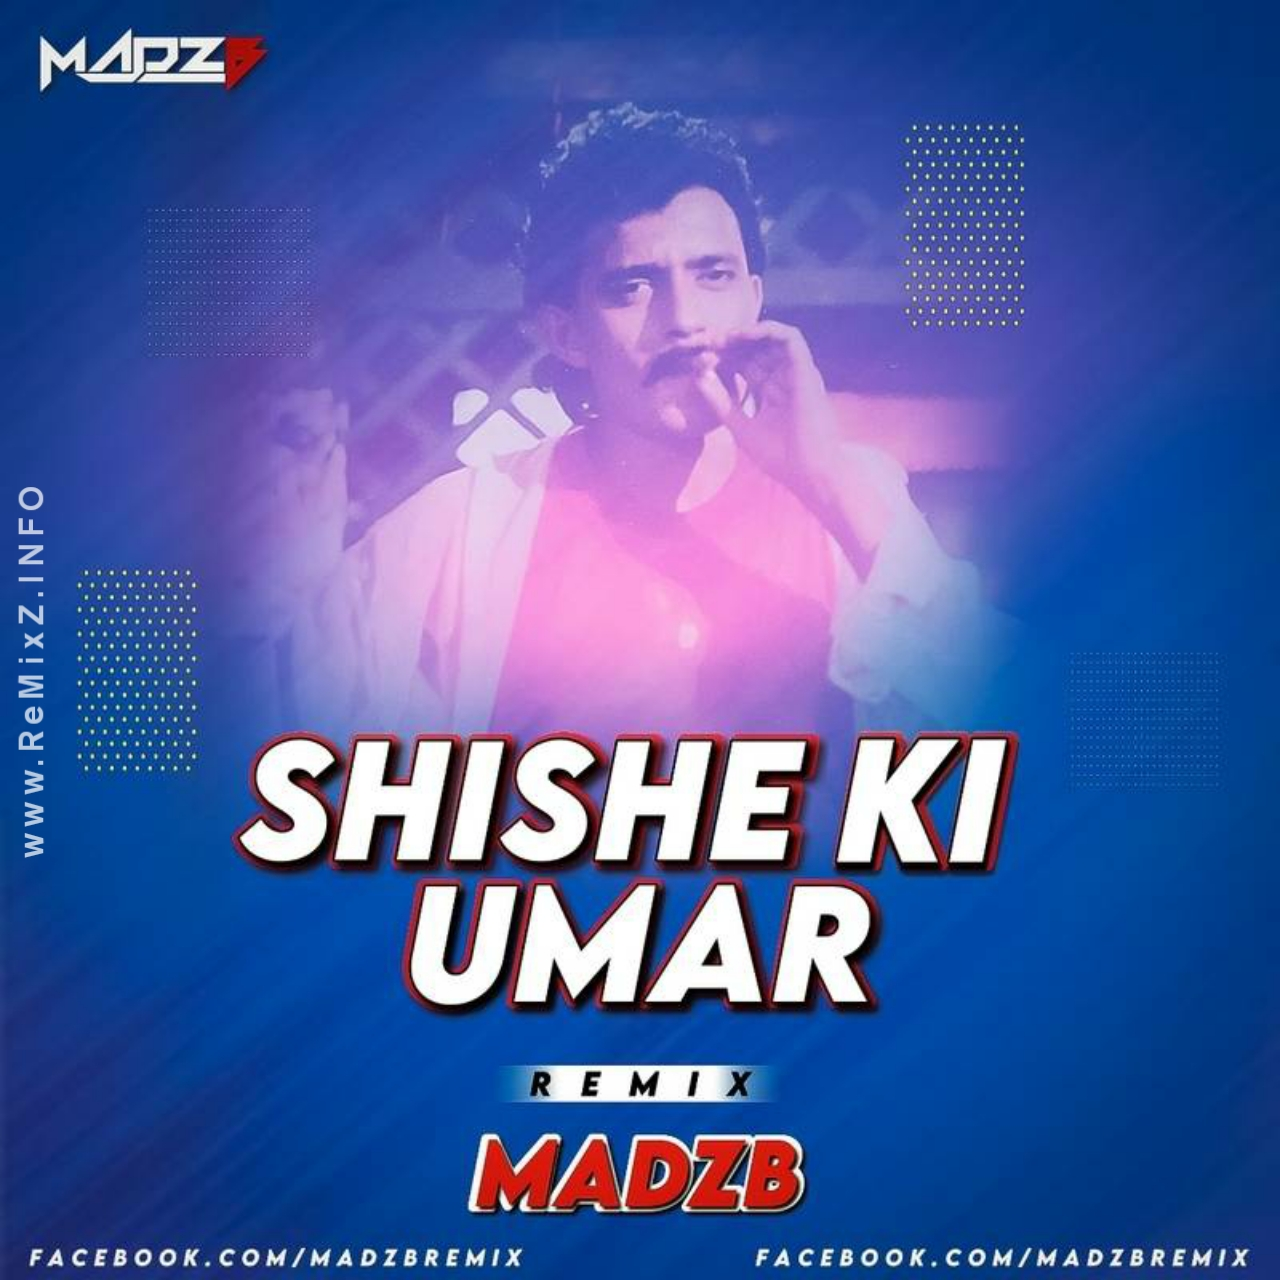 shishe-ki-umar-madzb-remix.jpg